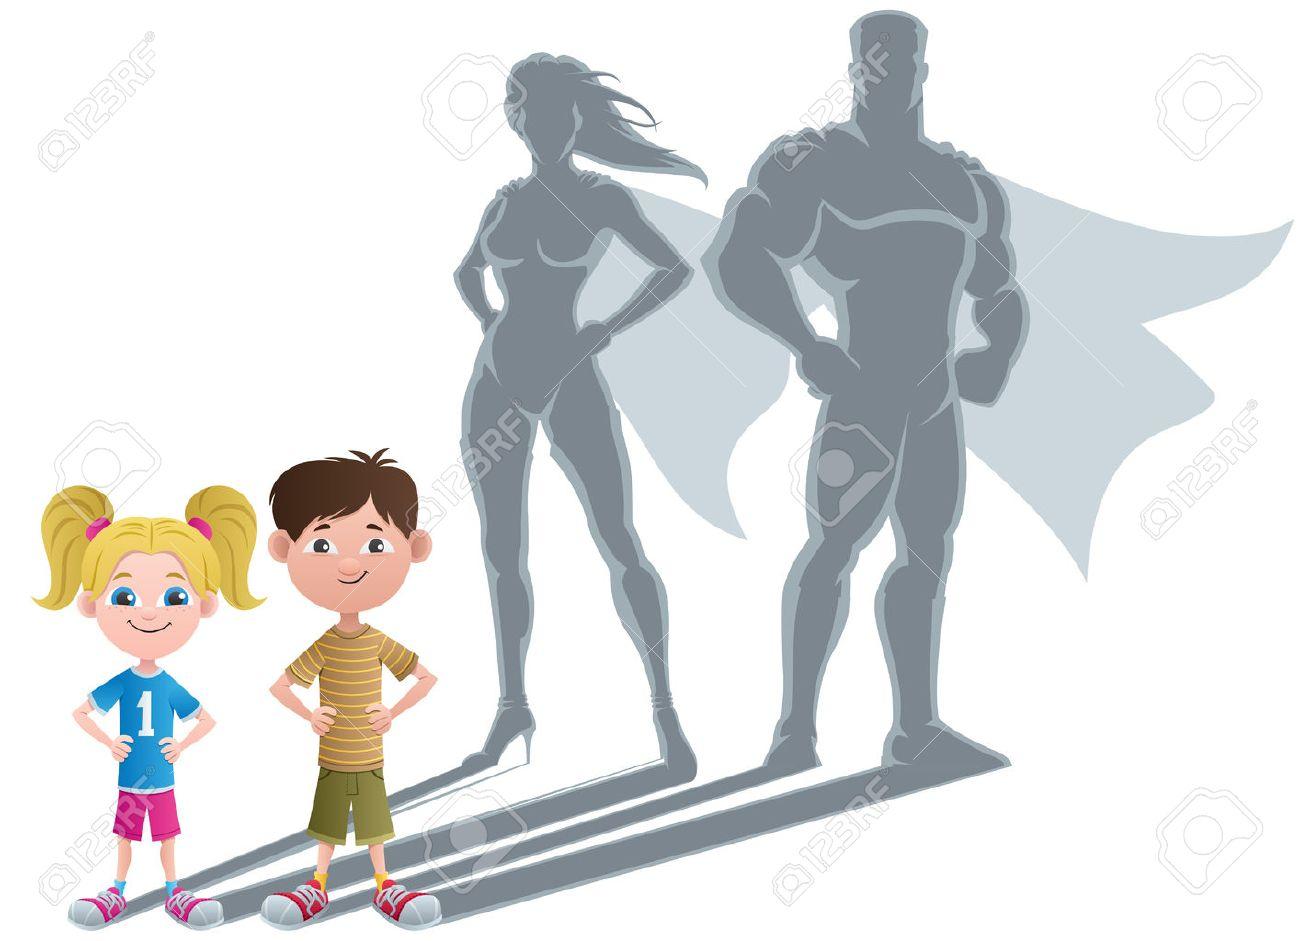 Conceptual illustration of little children with superhero shadows. - 25626946